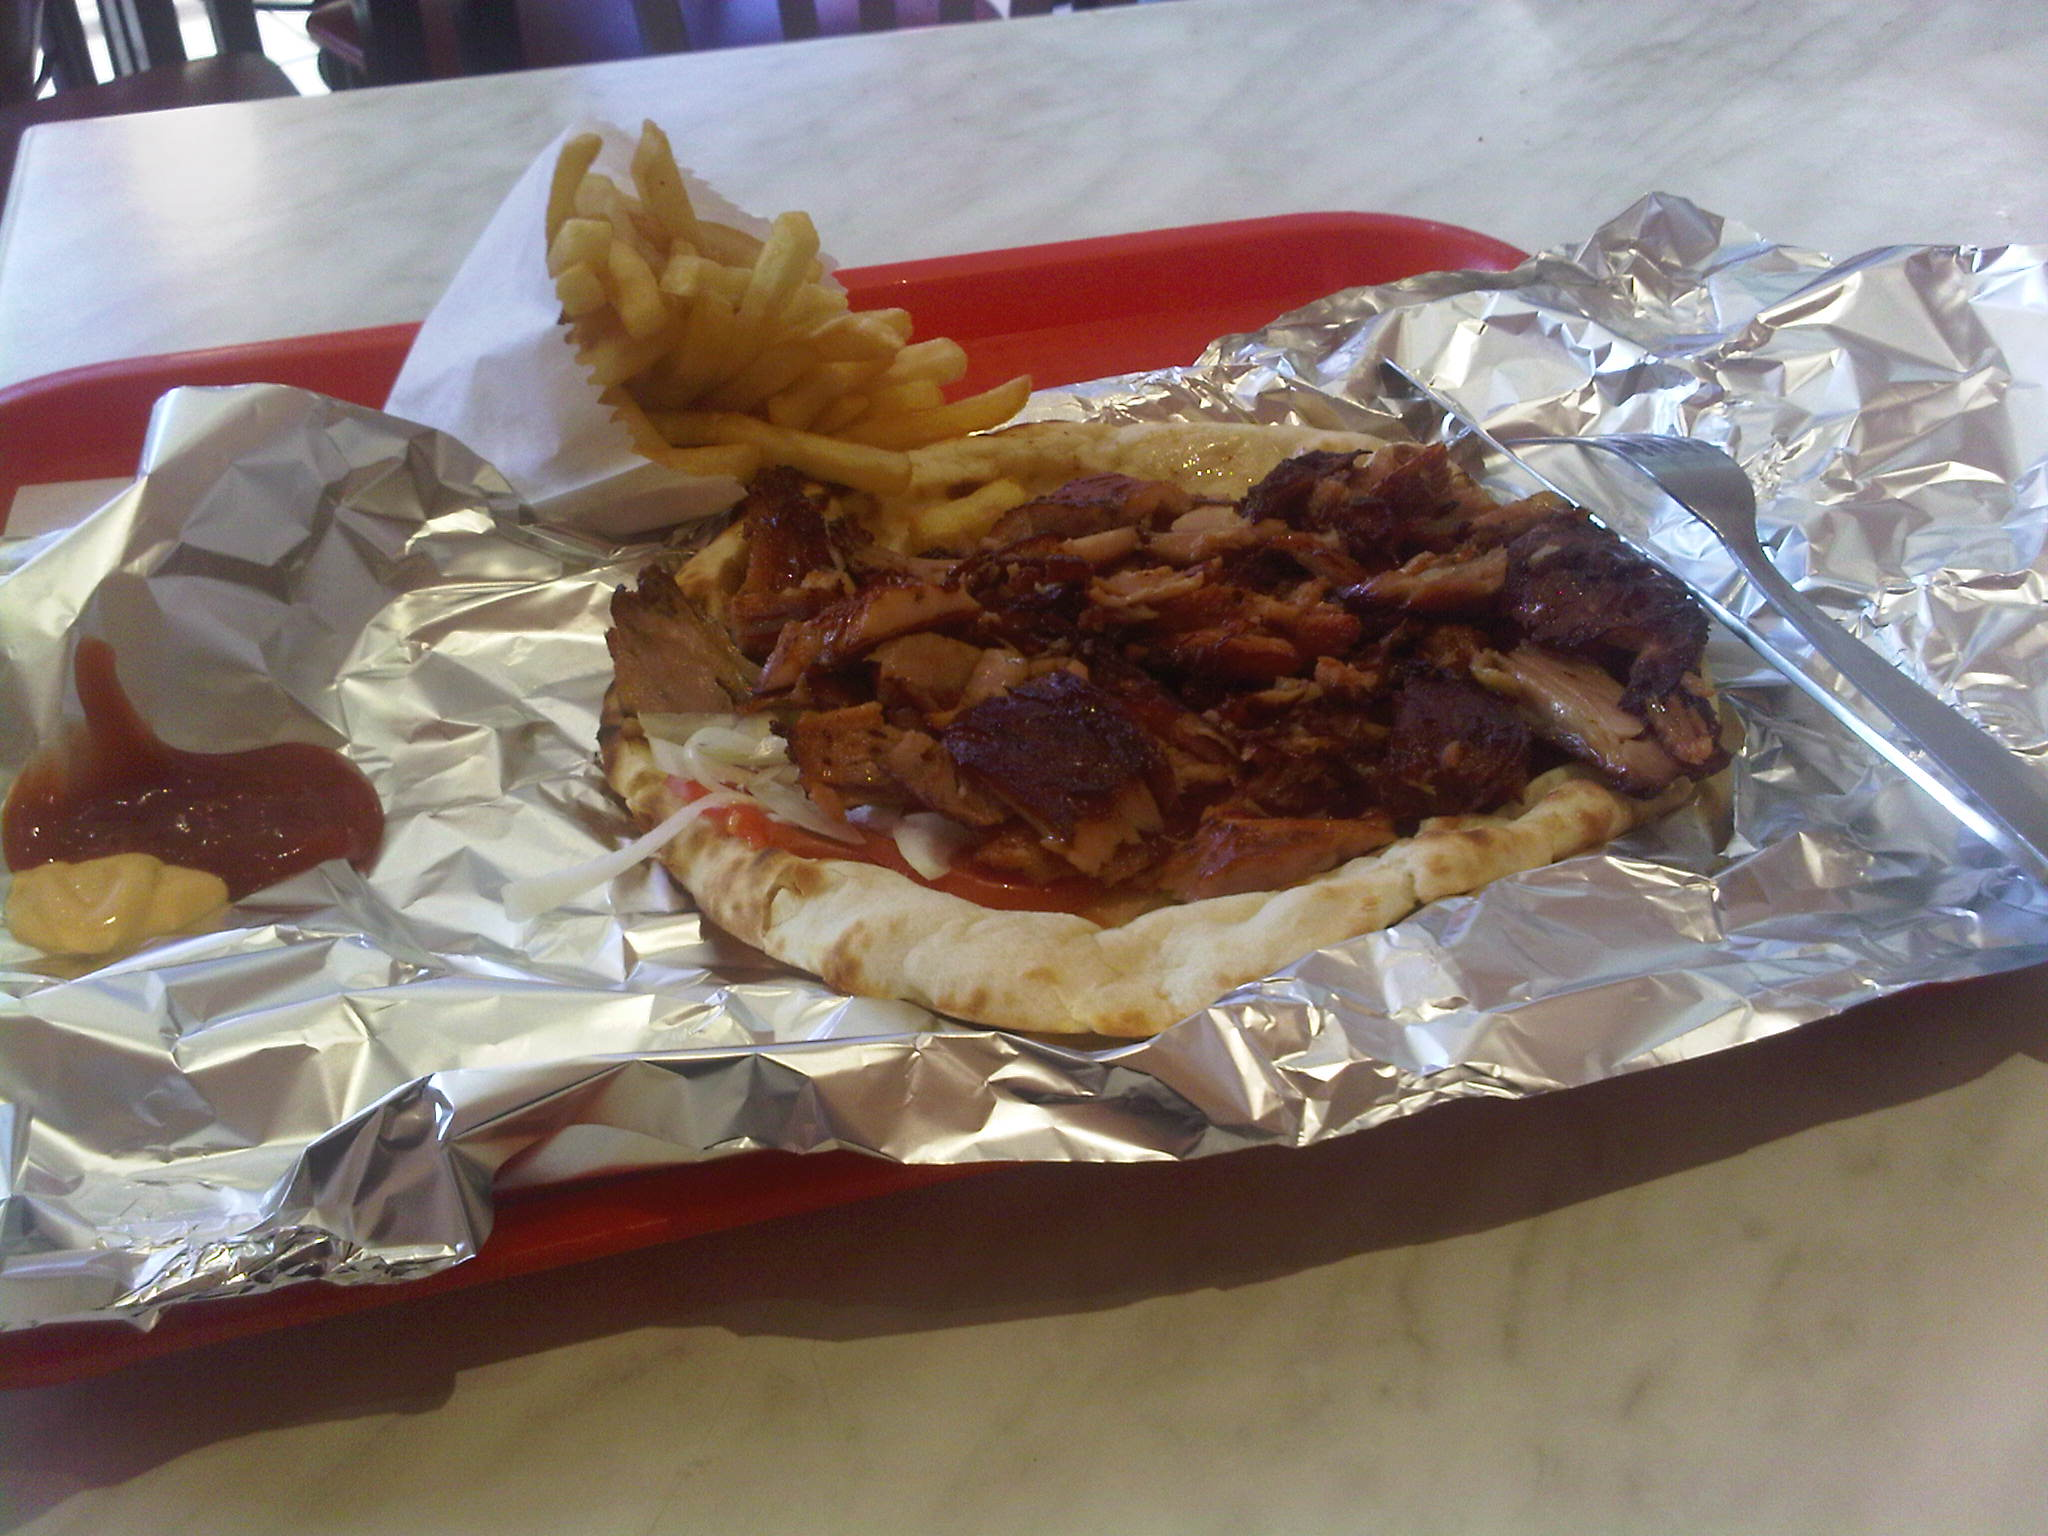 Kebab poulet naan fromage - Paris Fried Chicken Pfc à Paris